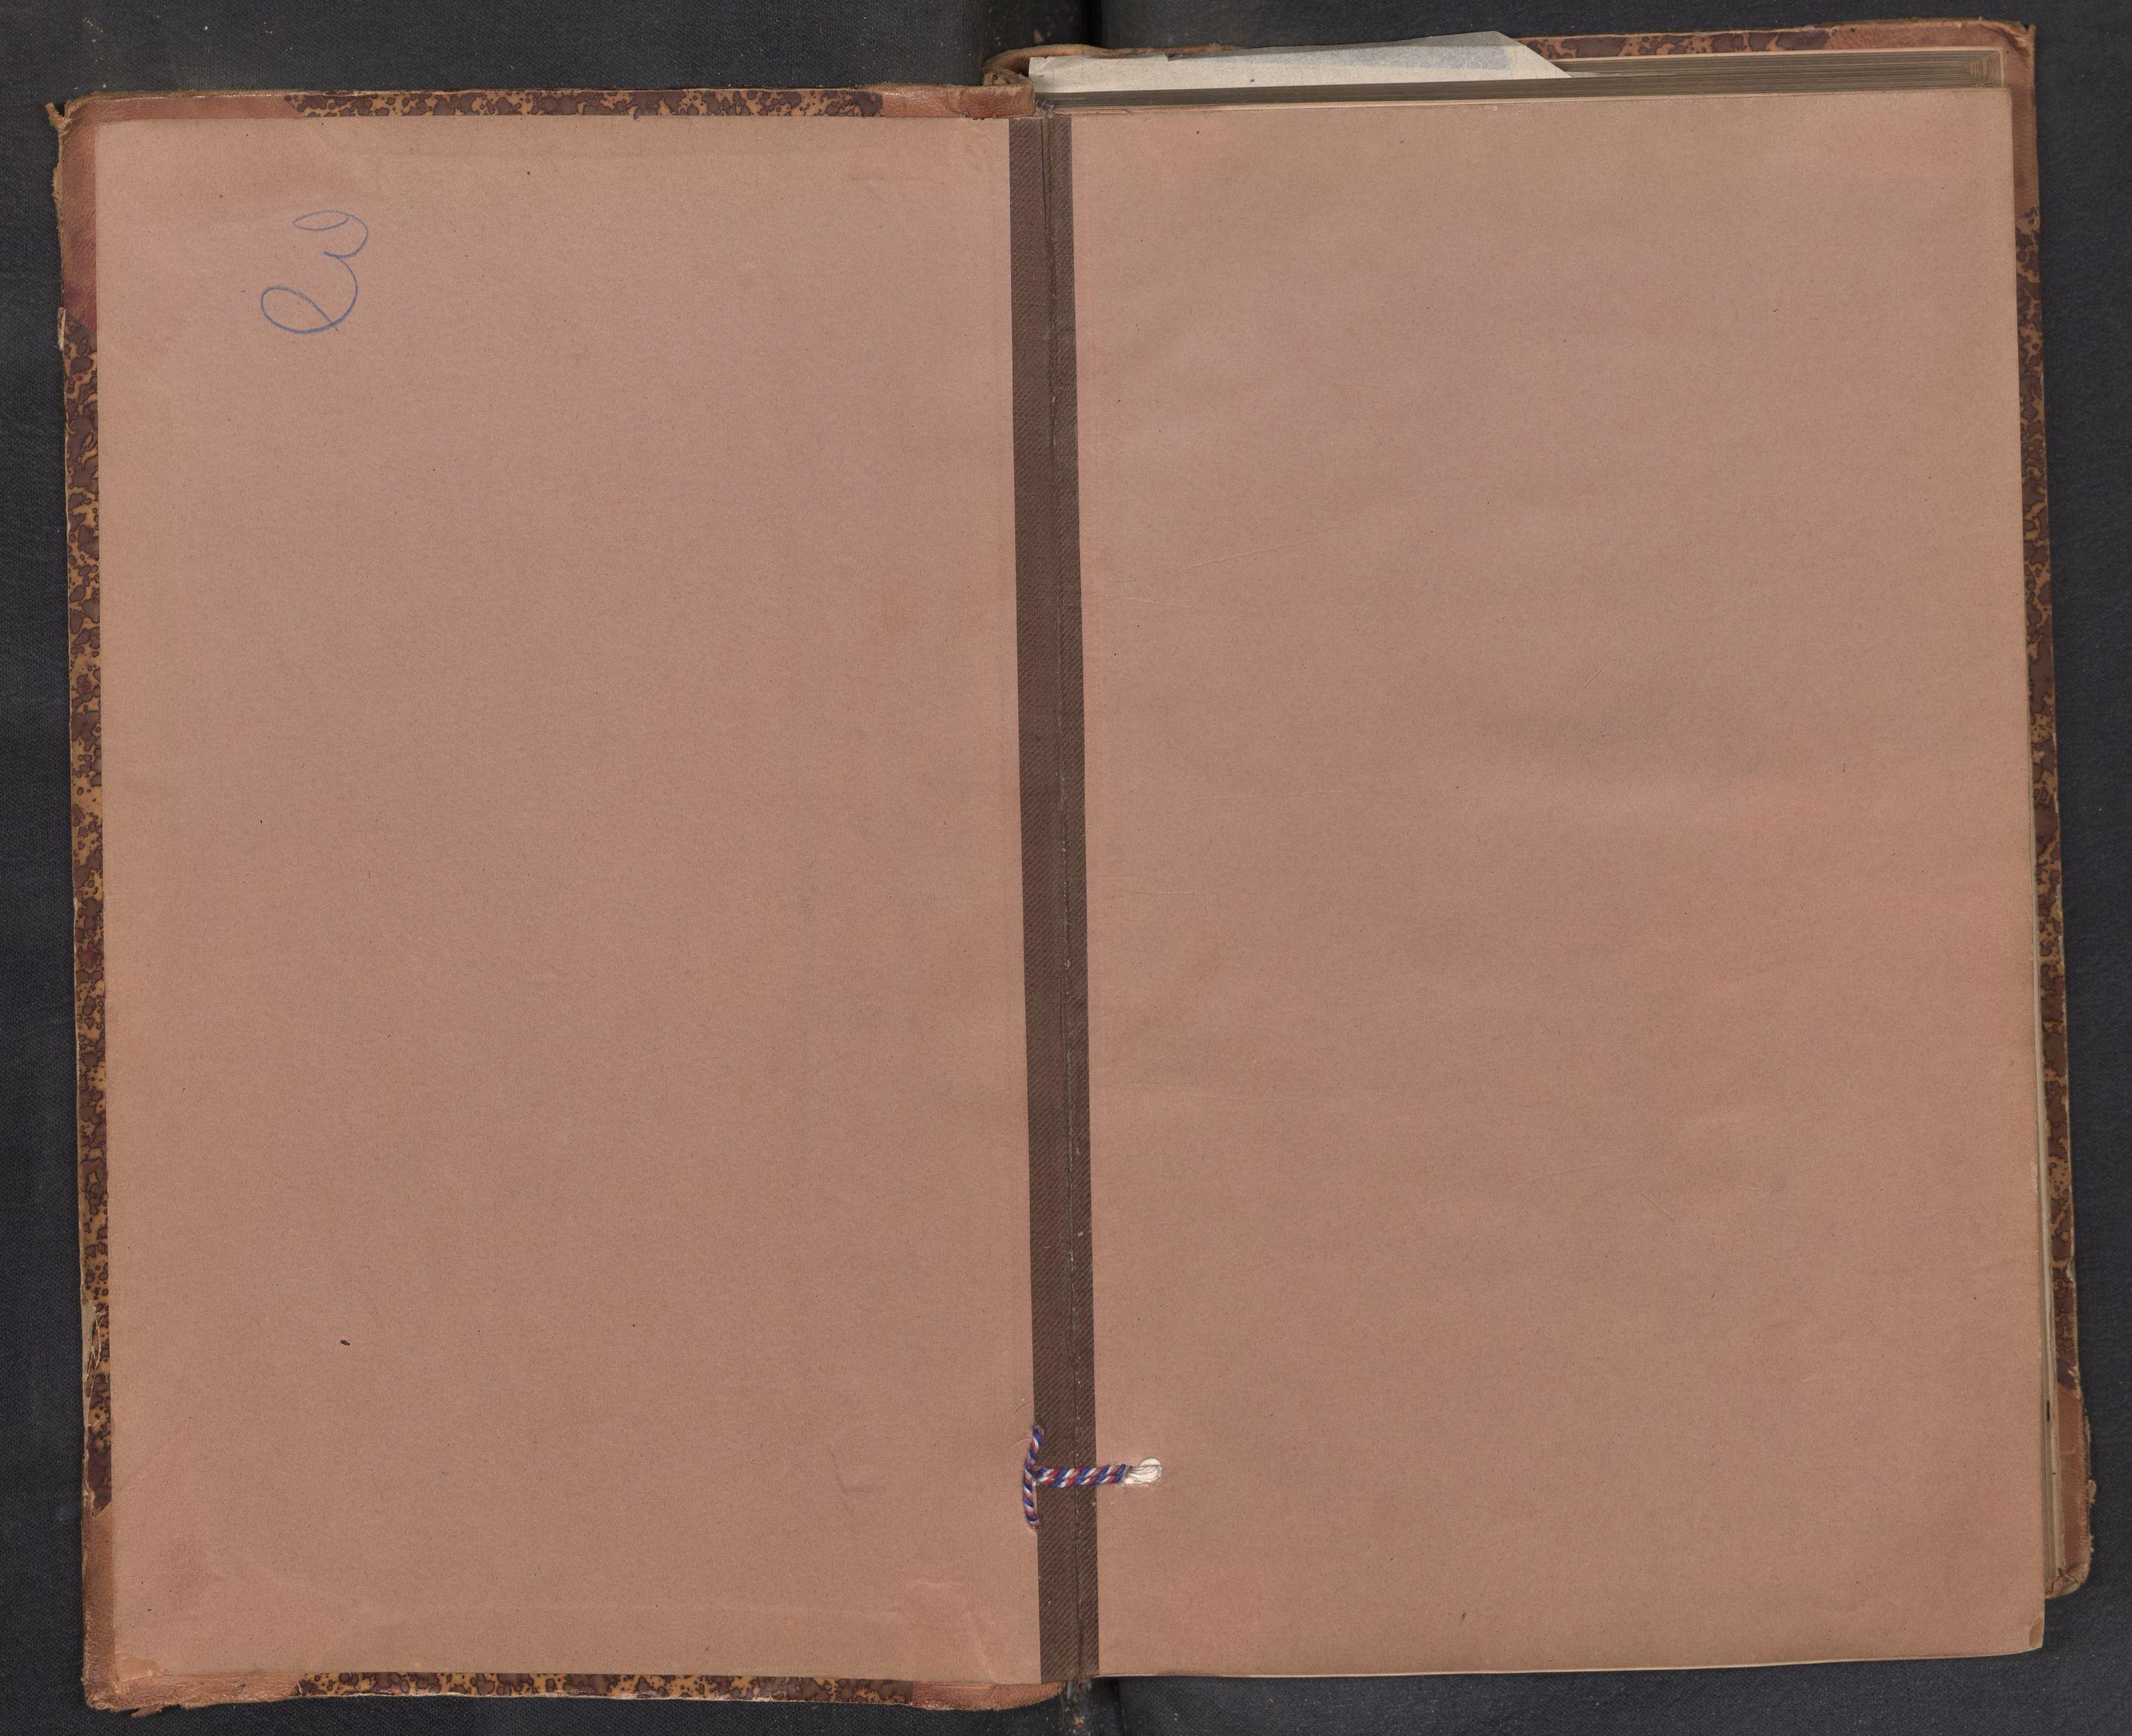 SAB, Lensmannen i Aurland, 0012/L0004: Branntakstprotokoll, skjematakst, 1895-1911